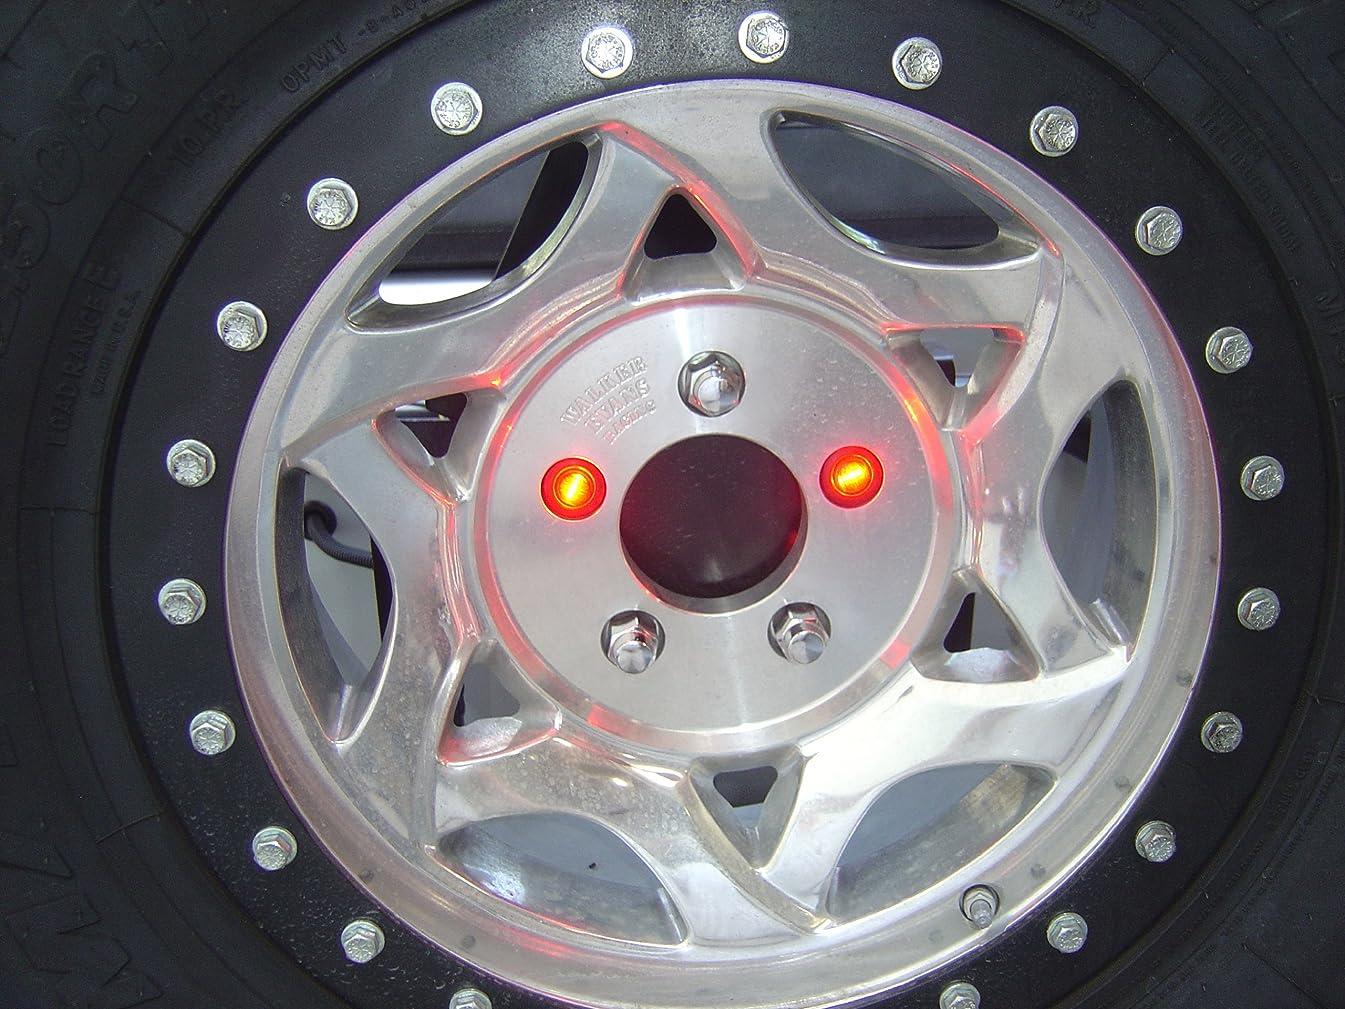 Delta Lights (01-6581-50) Lug-NUT-LITE Universal Waterproof LED 3rd Brakes Light for Spare Tire